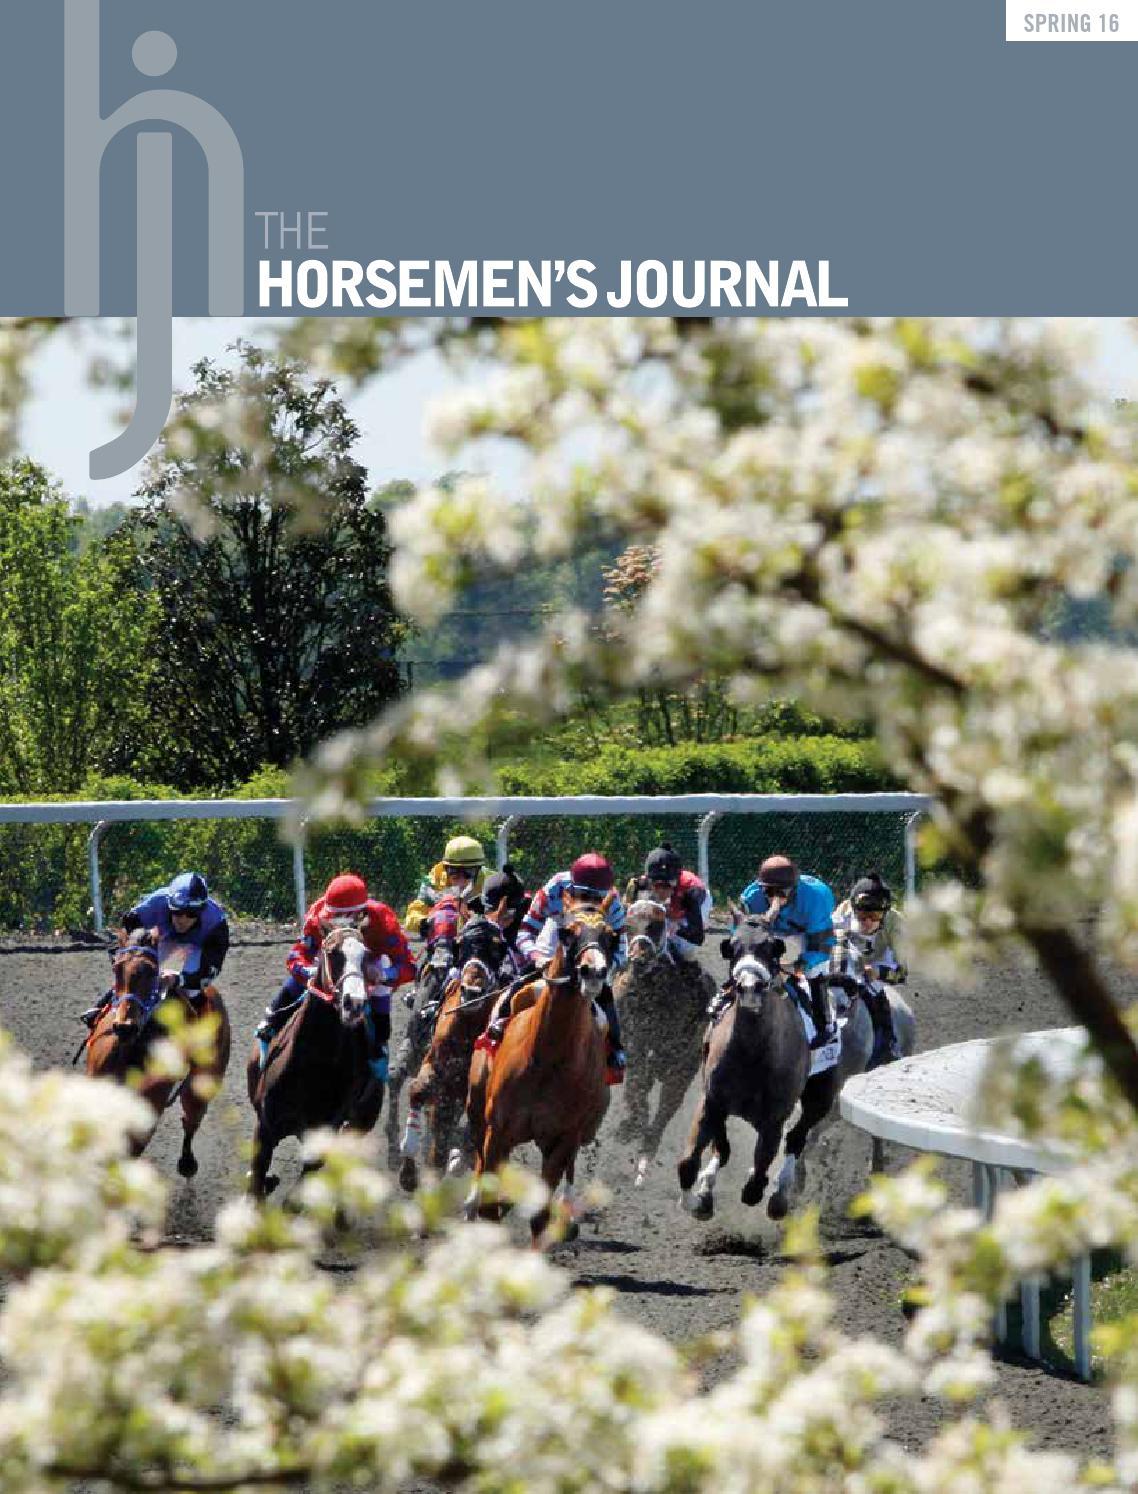 The Horsemen's Journal - Spring 2016 by The Horsemen's